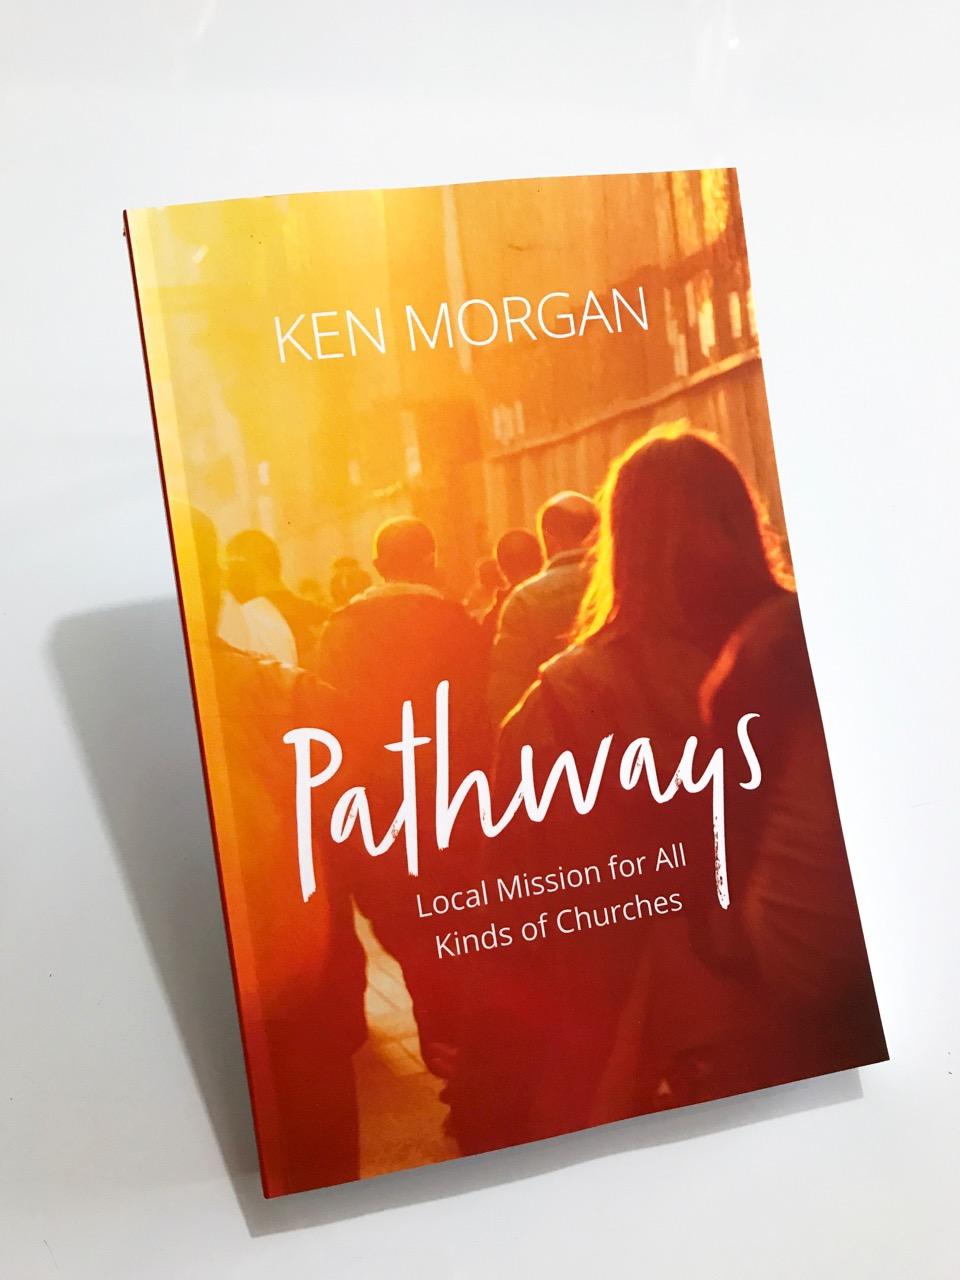 Pathways 4 Mission by Ken Morgan Book